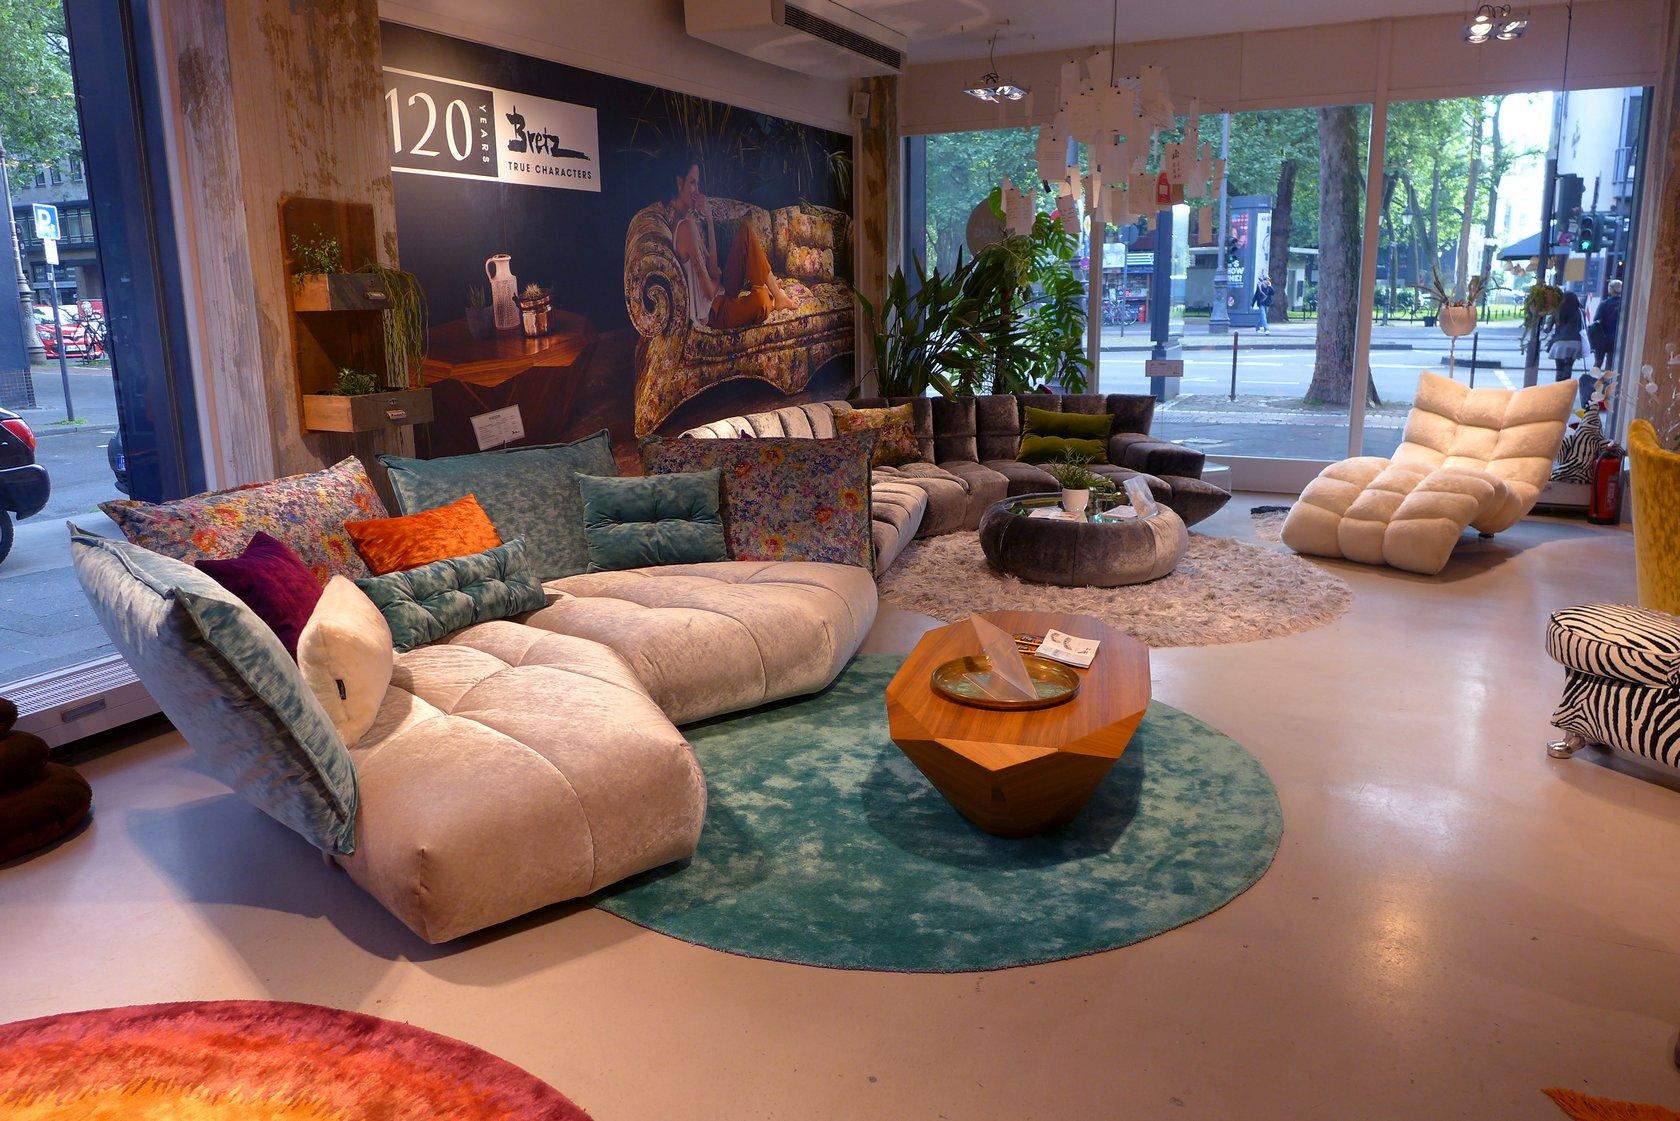 bretz flagship store koeln 2017 05 22 015 bretz store k ln. Black Bedroom Furniture Sets. Home Design Ideas